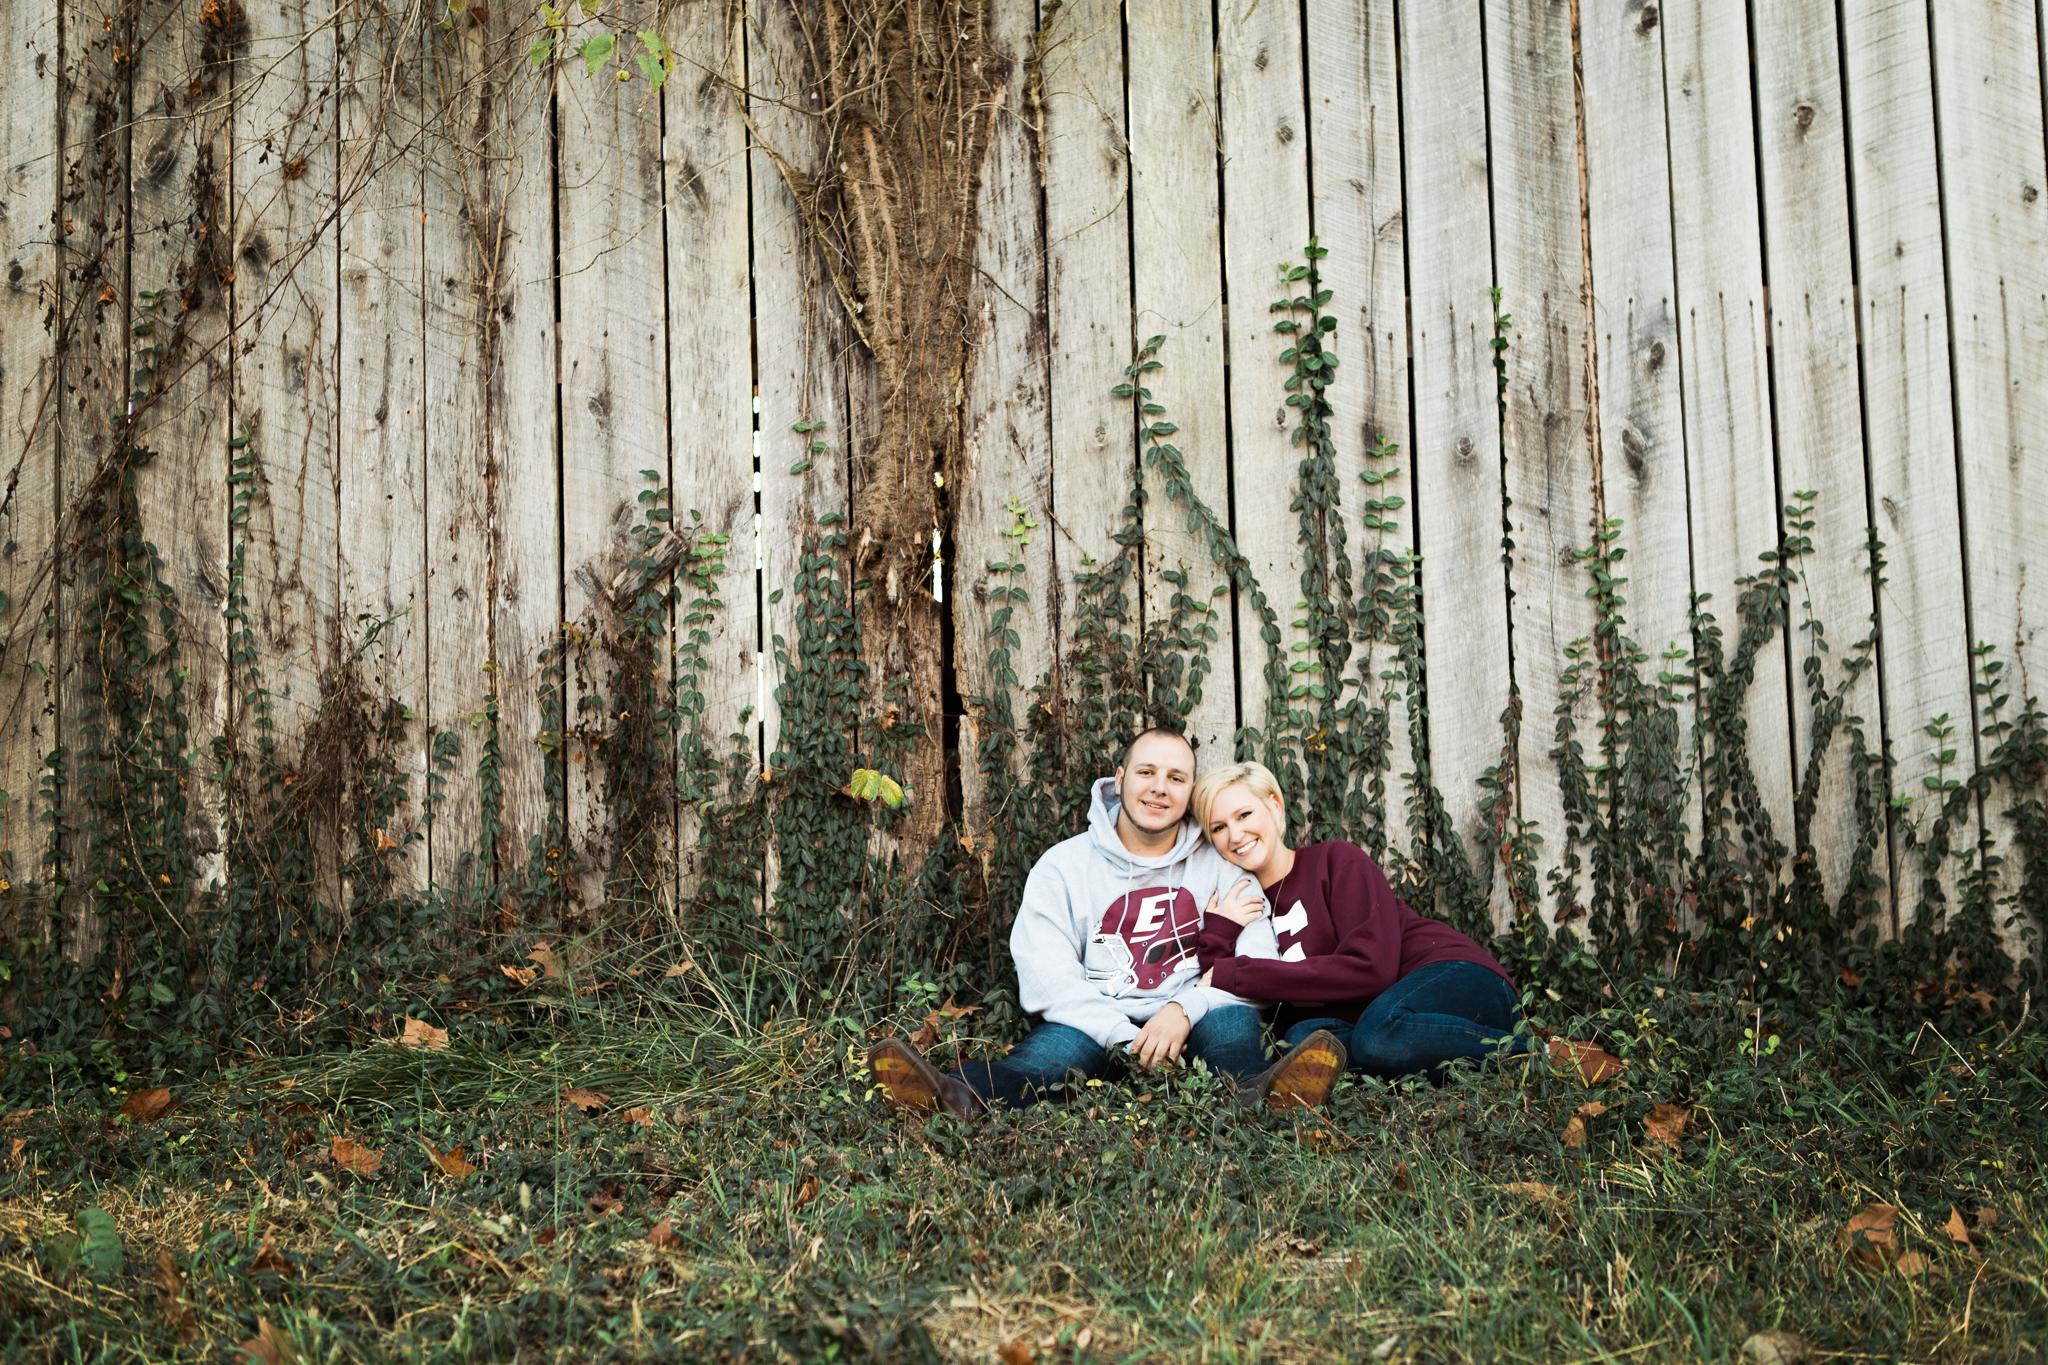 Richmond Kentucky Engagement Photographer - Ariana Jordan Photography -22.jpg